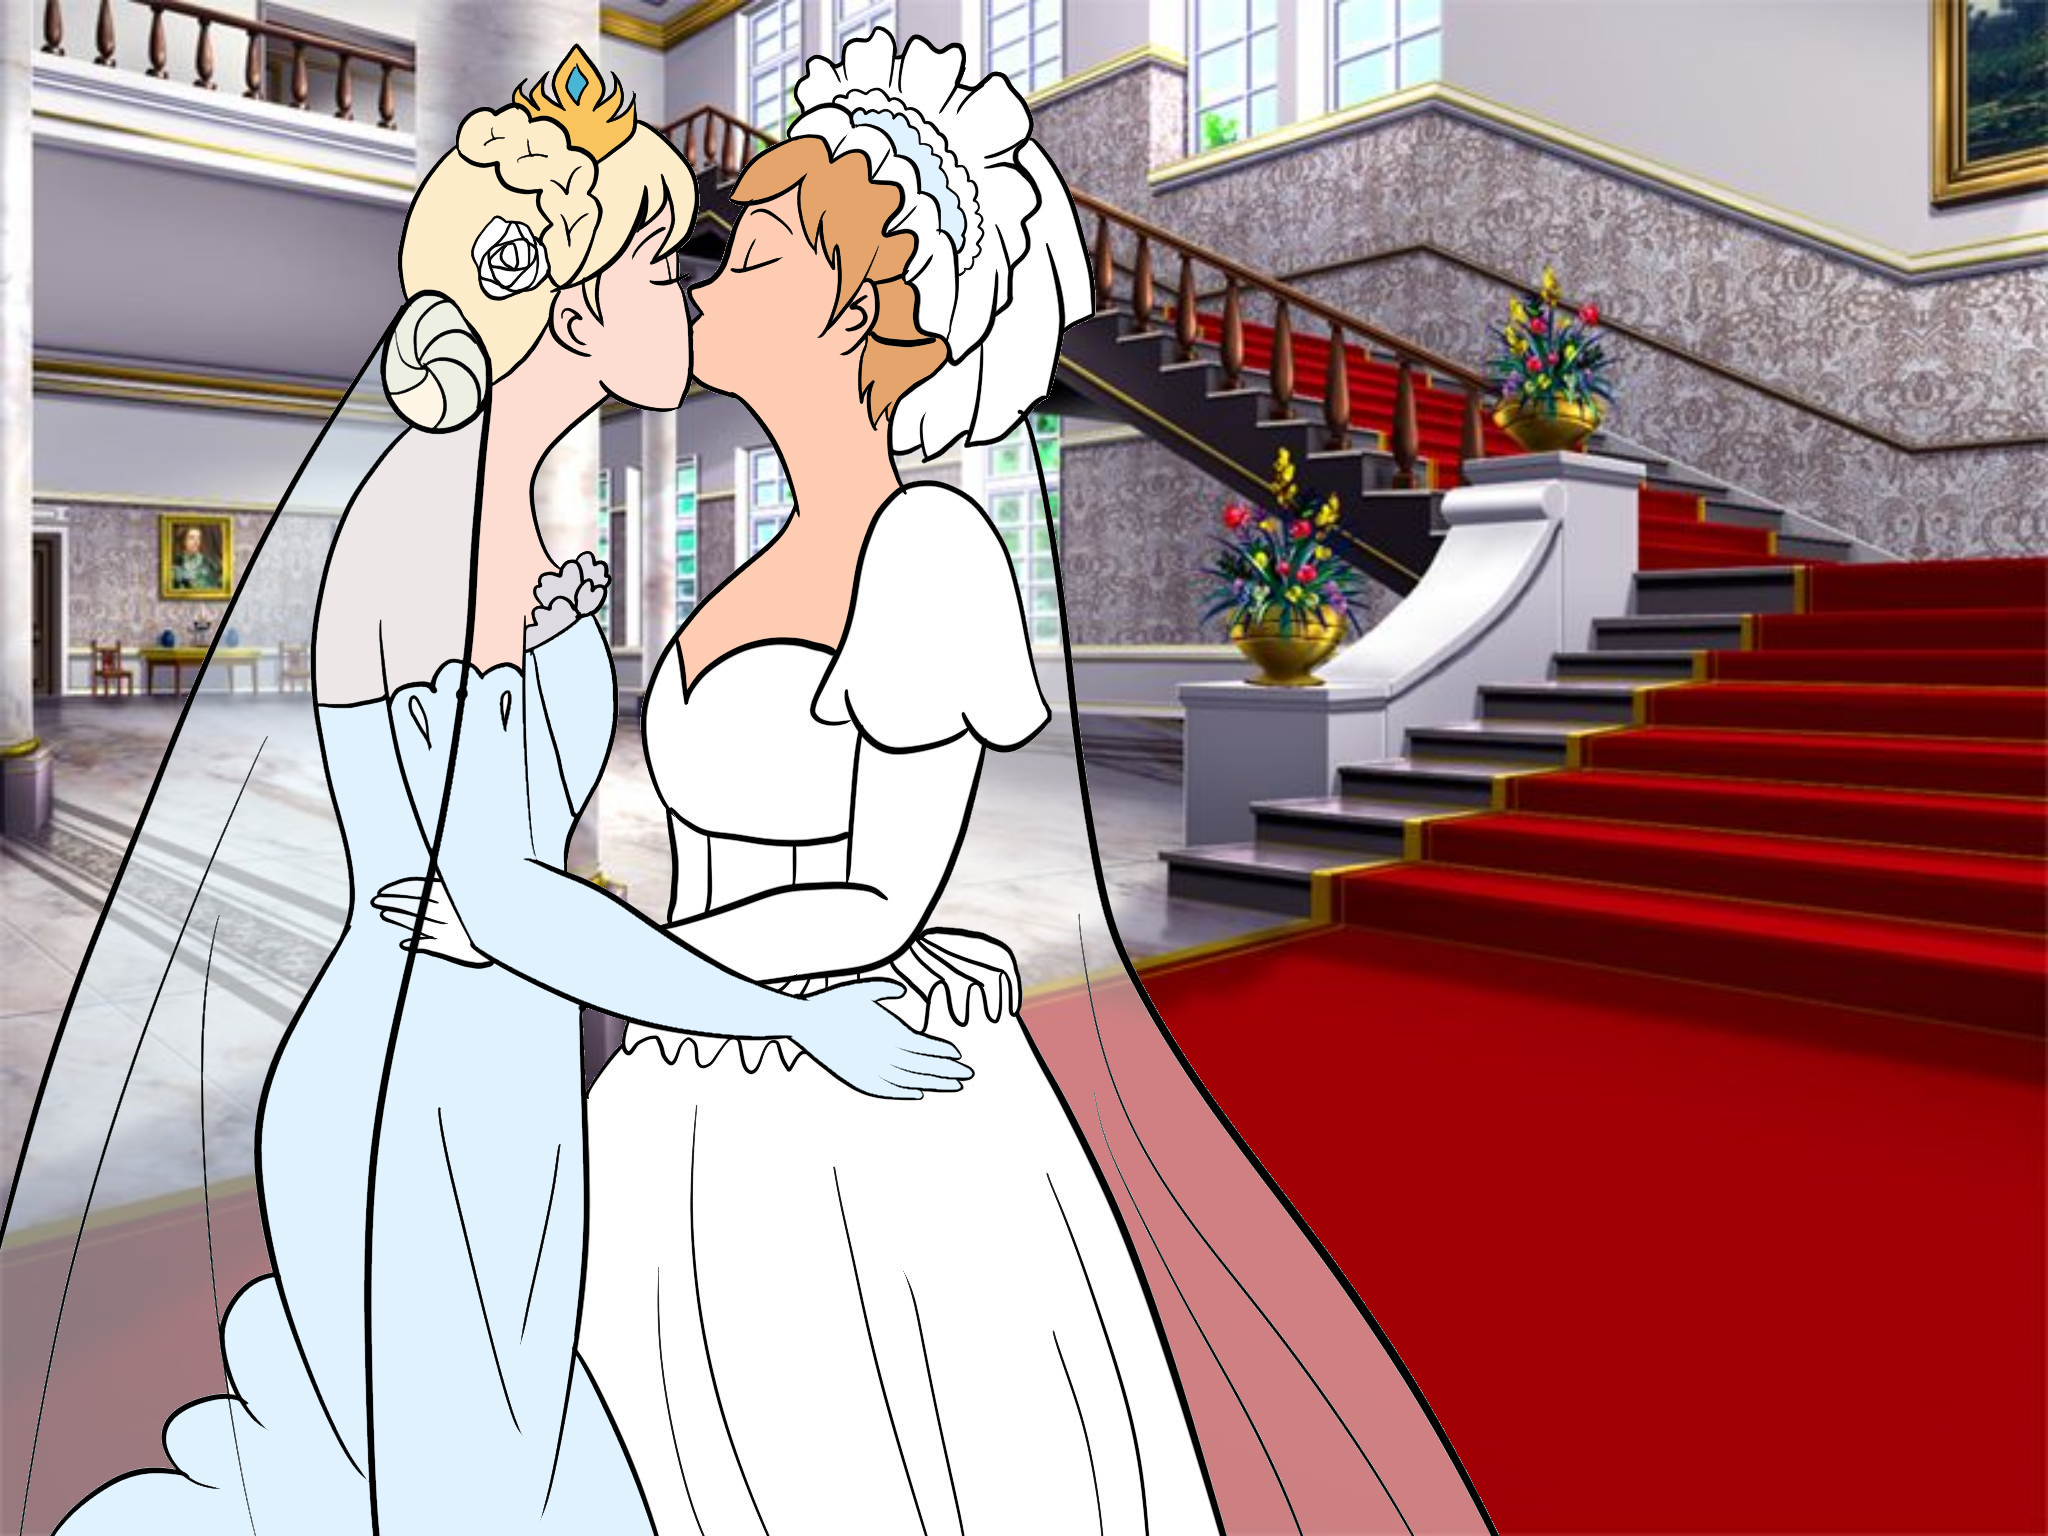 Elsanna wedding drawing 11 by Arendellecitizen